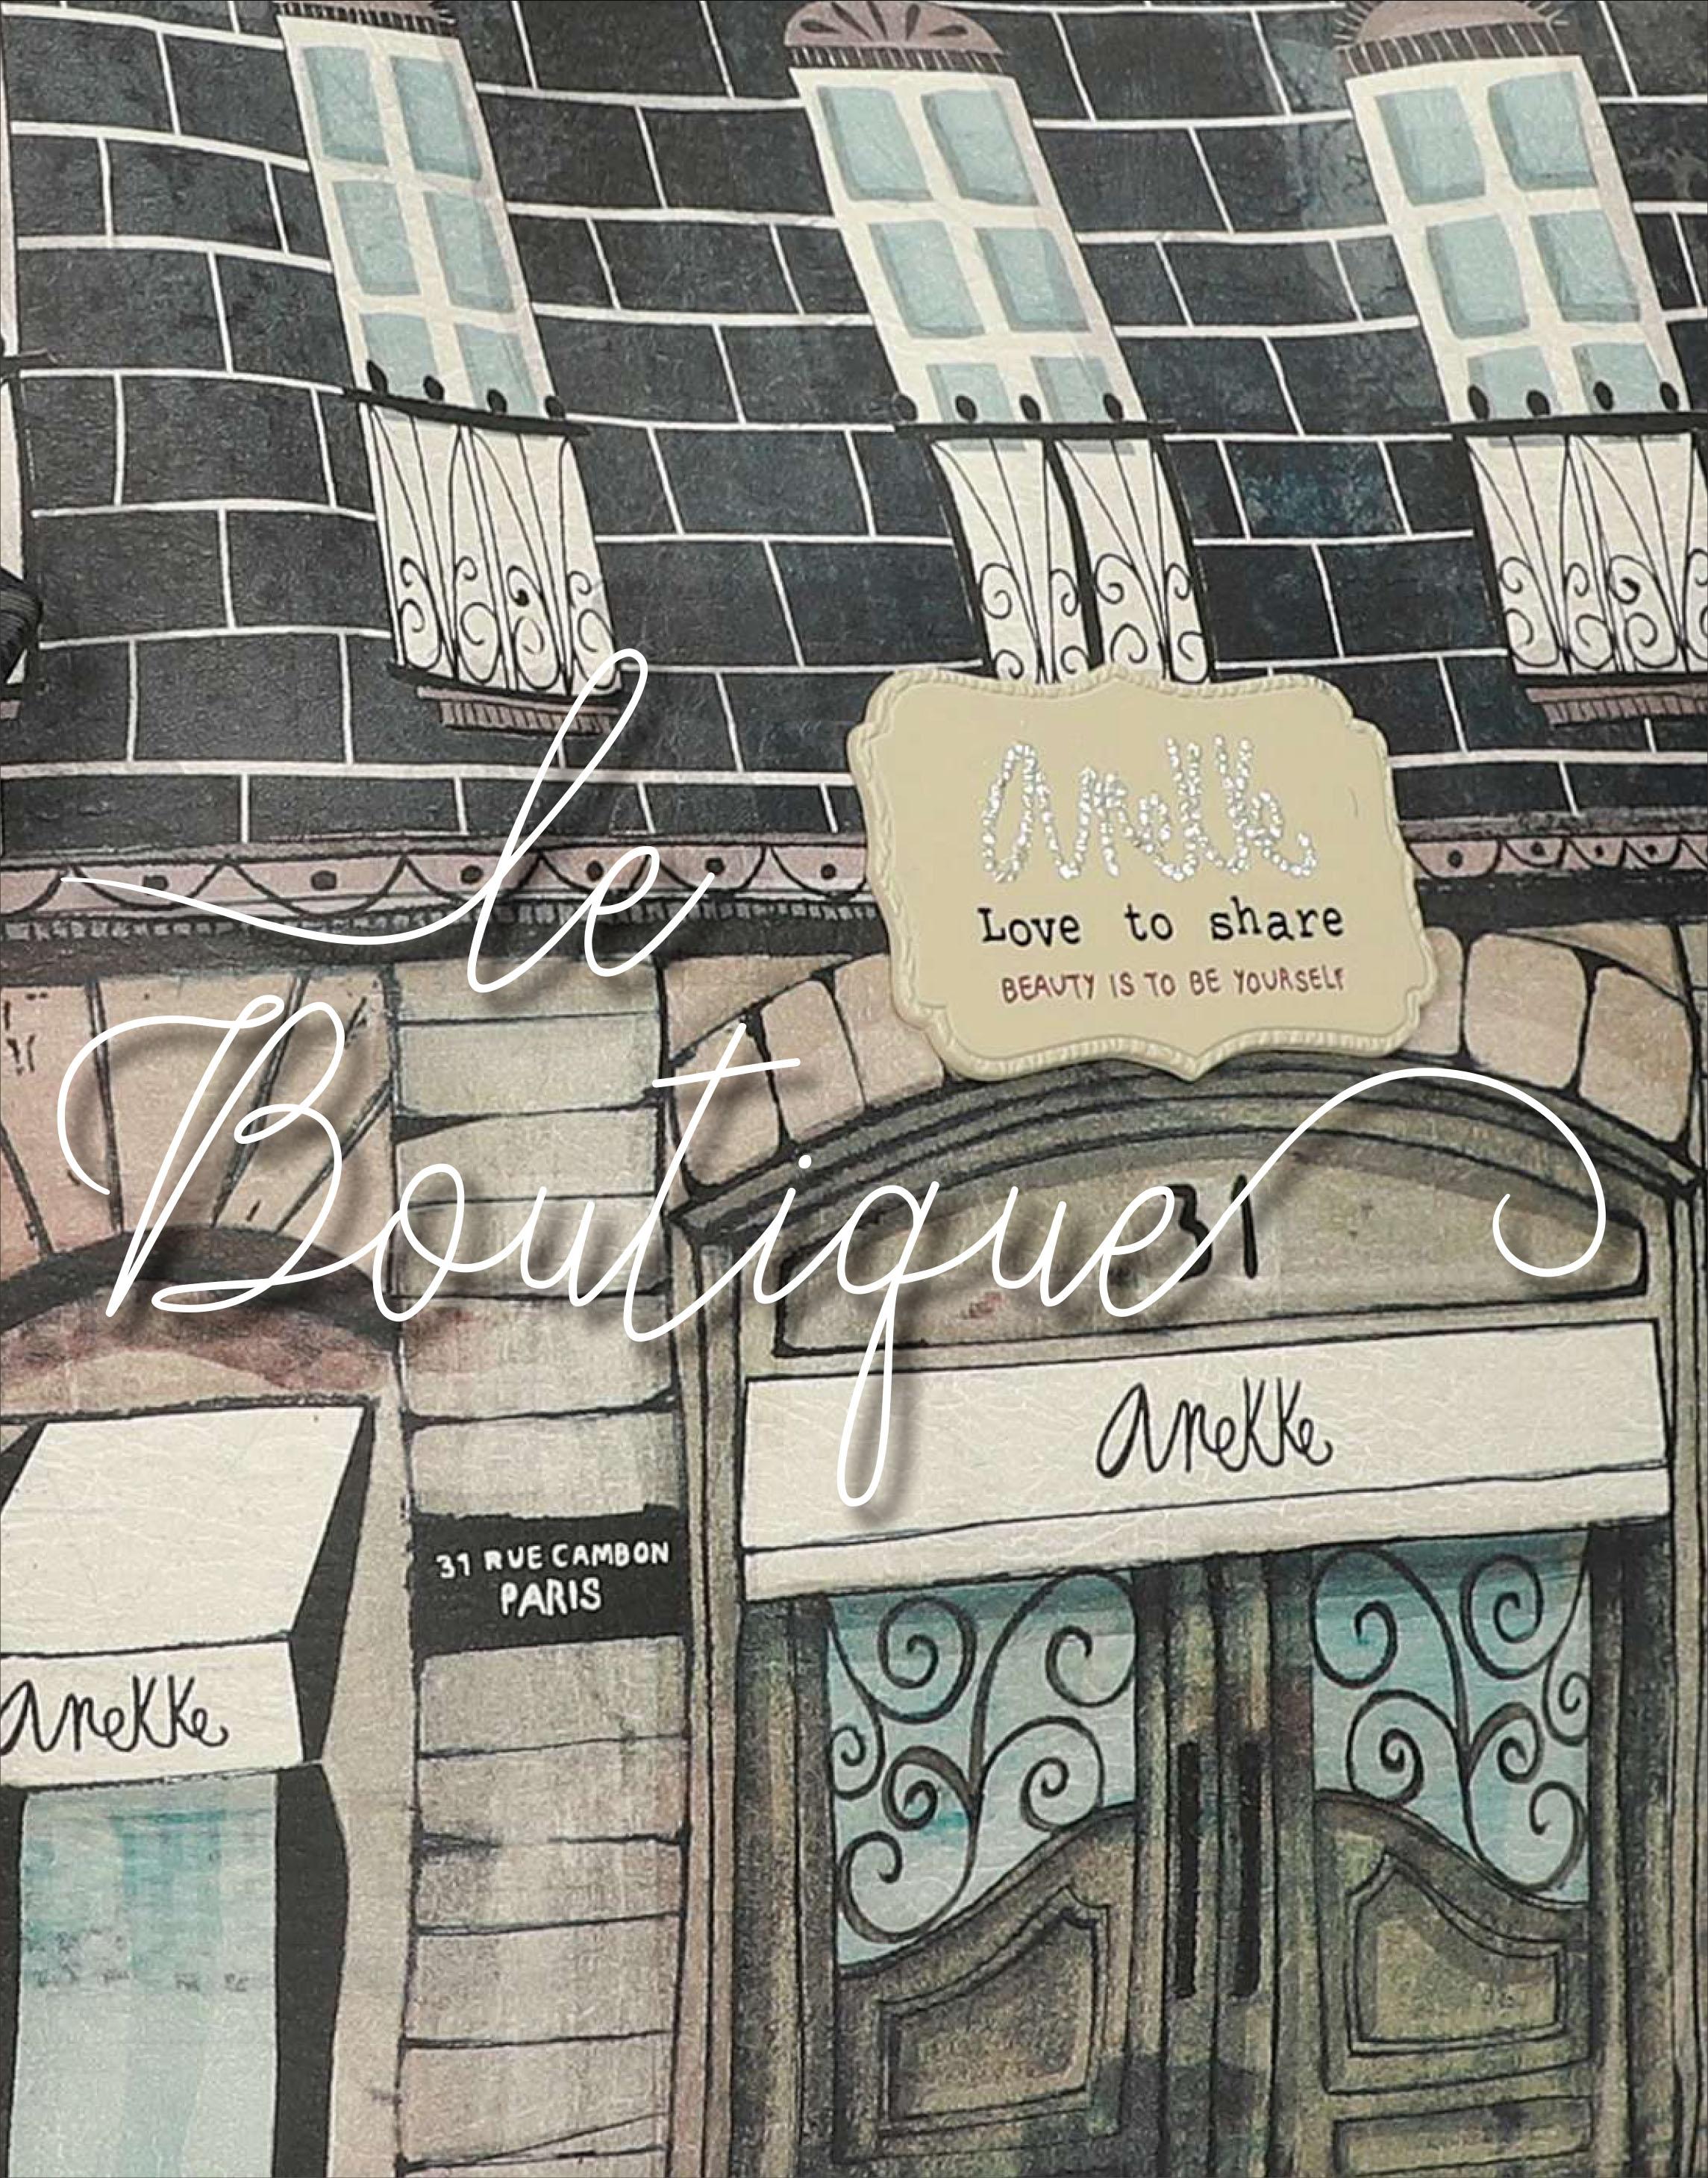 Colección Le Boutique Anekke